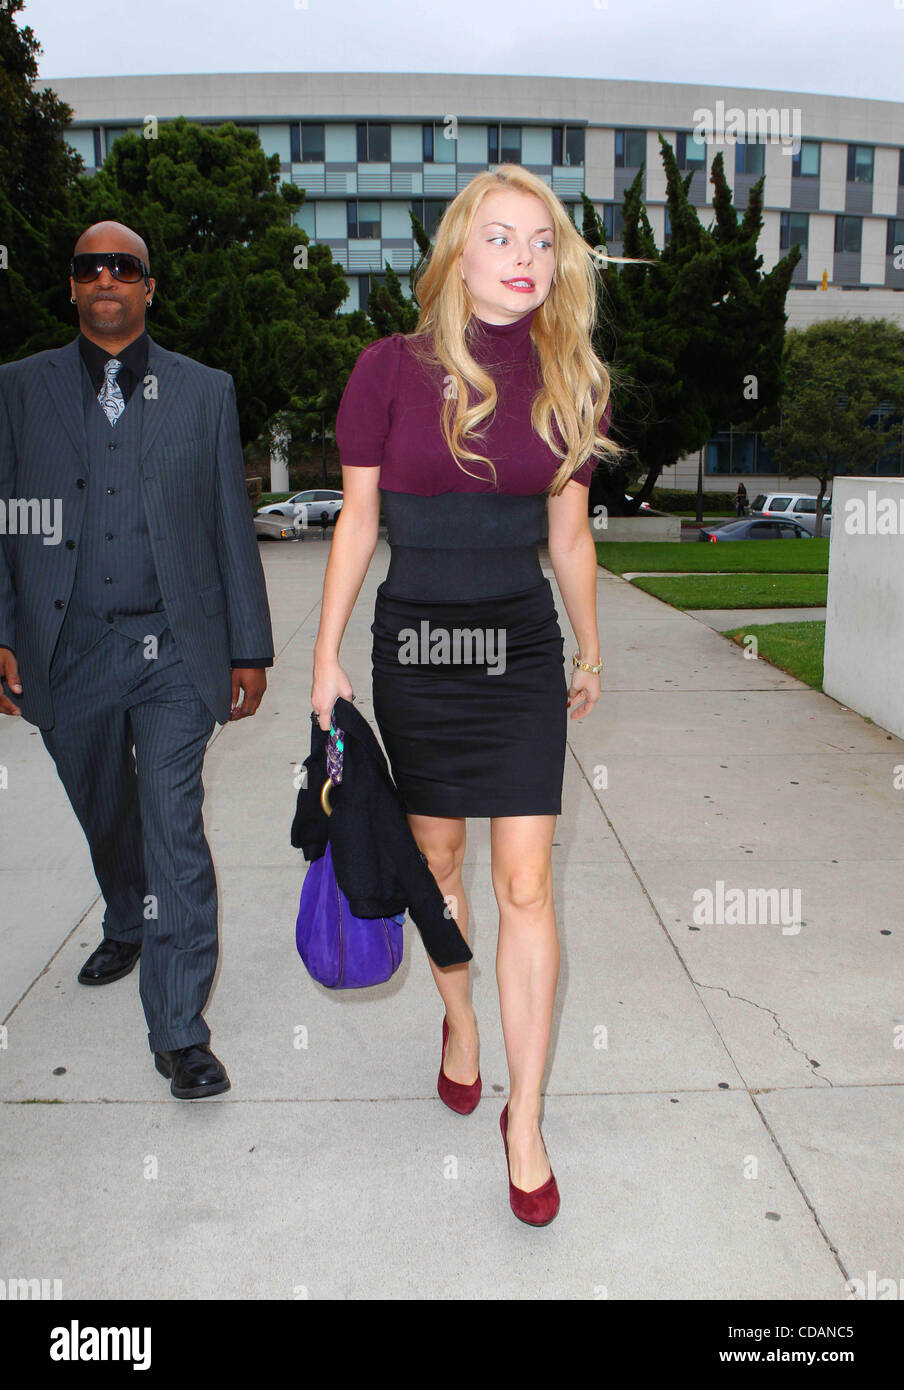 Sept. 9, 2010 - Los Angeles, California, U.S. - Izabella Miko gets a restraining order against her pervert stalker - Stock Image